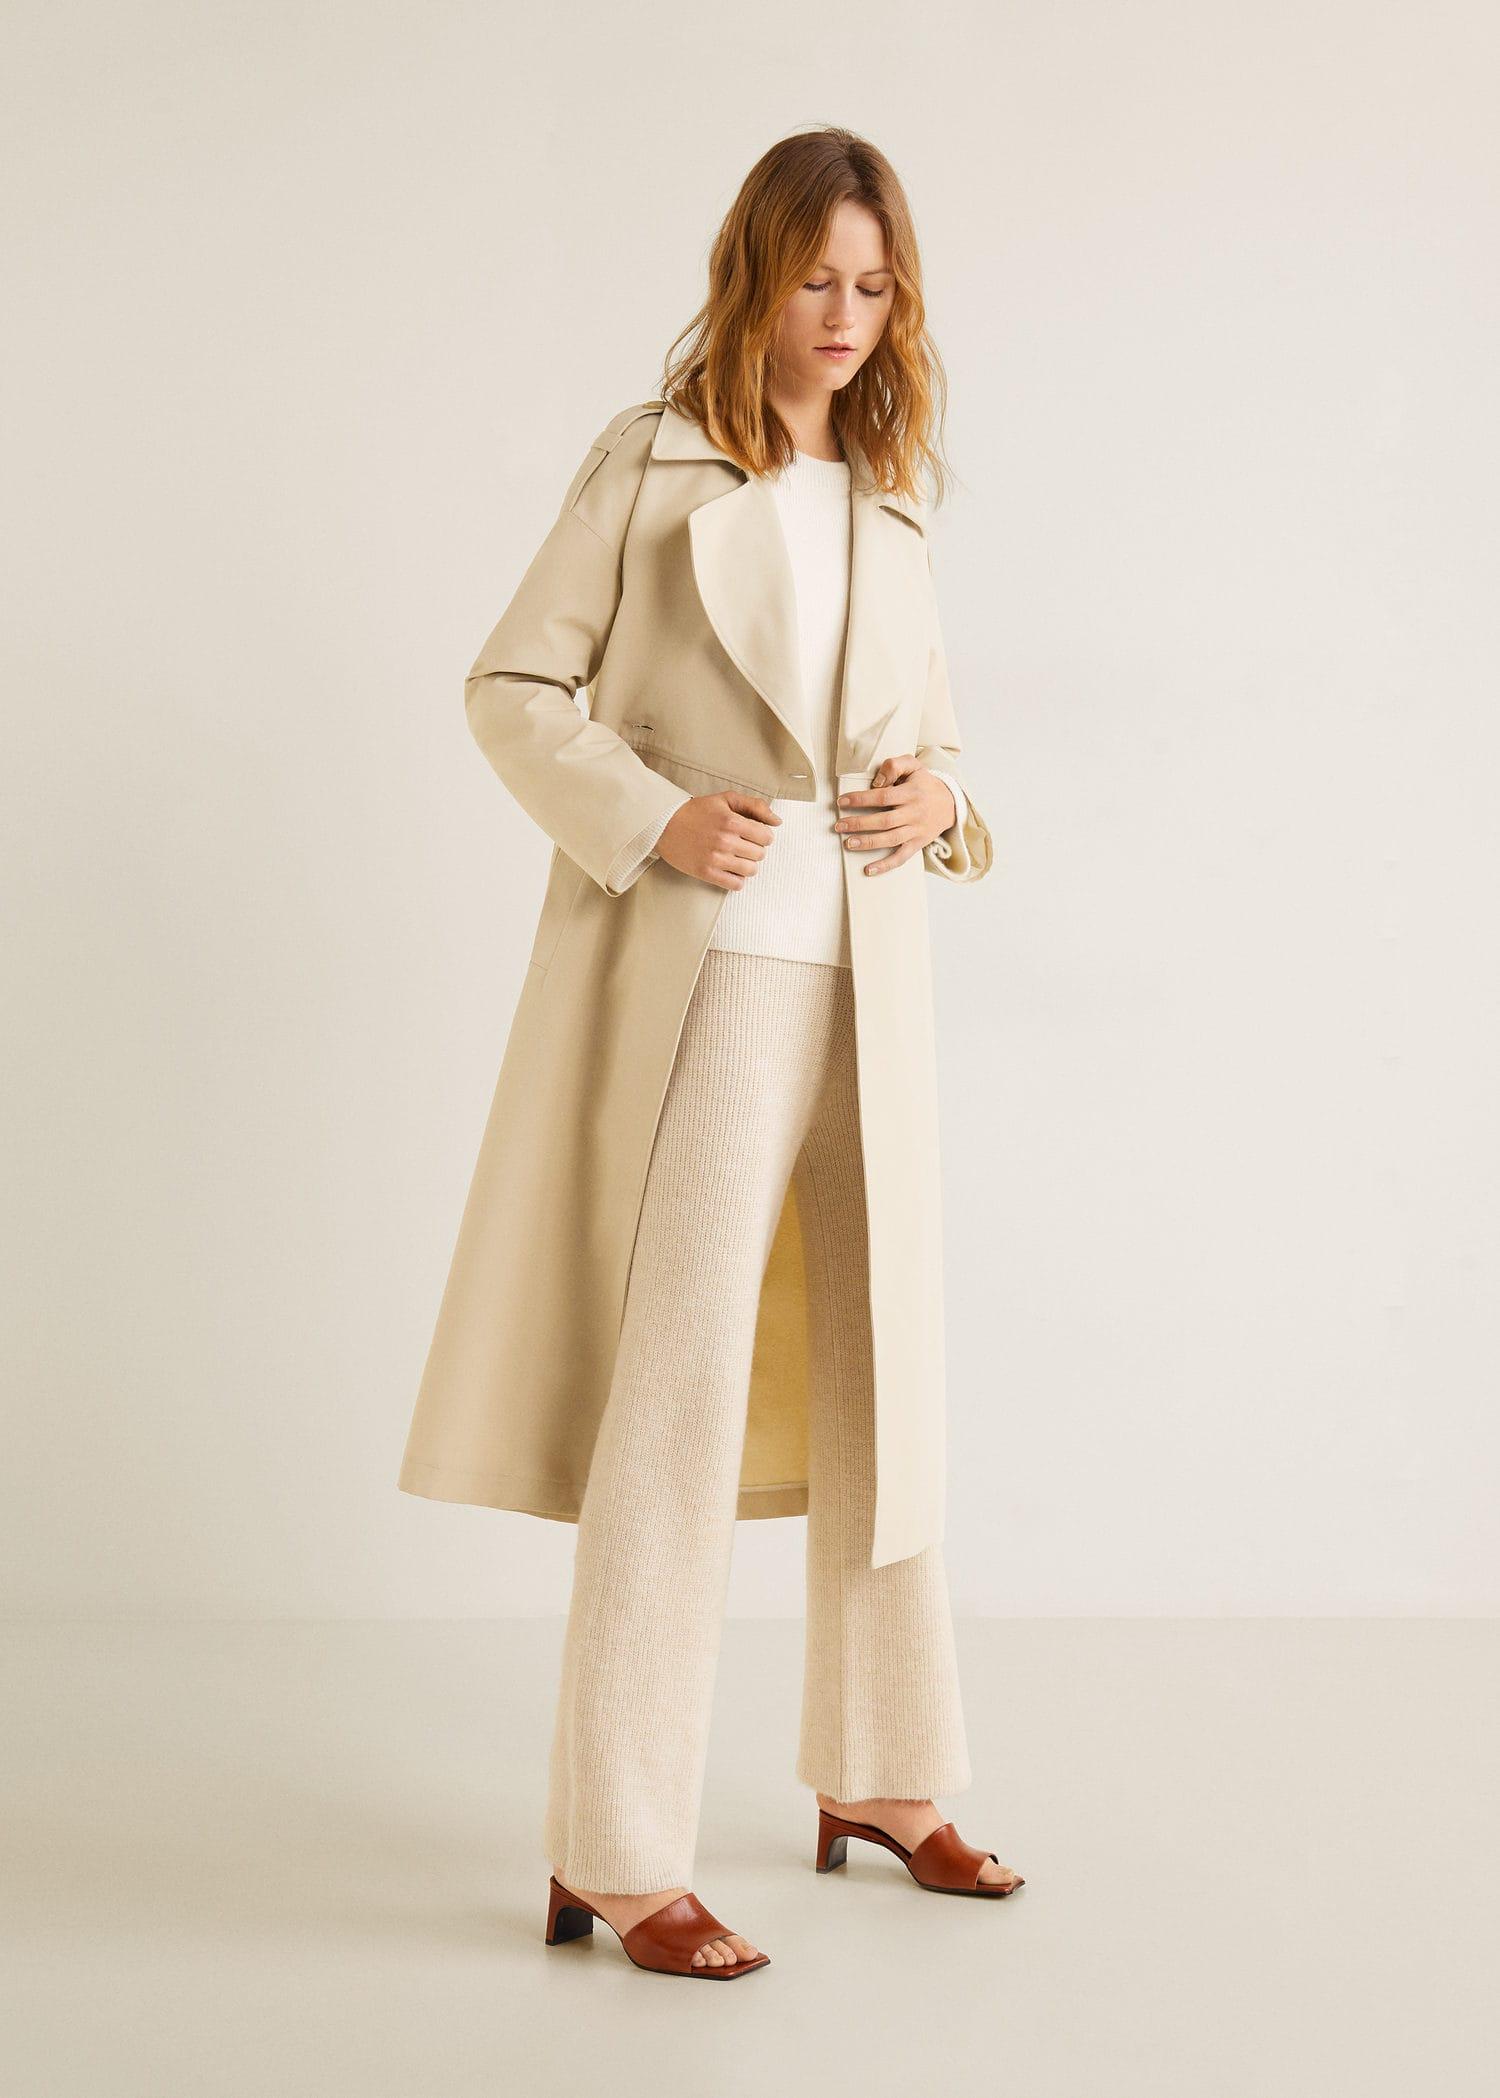 Camelfarbener mantel damen